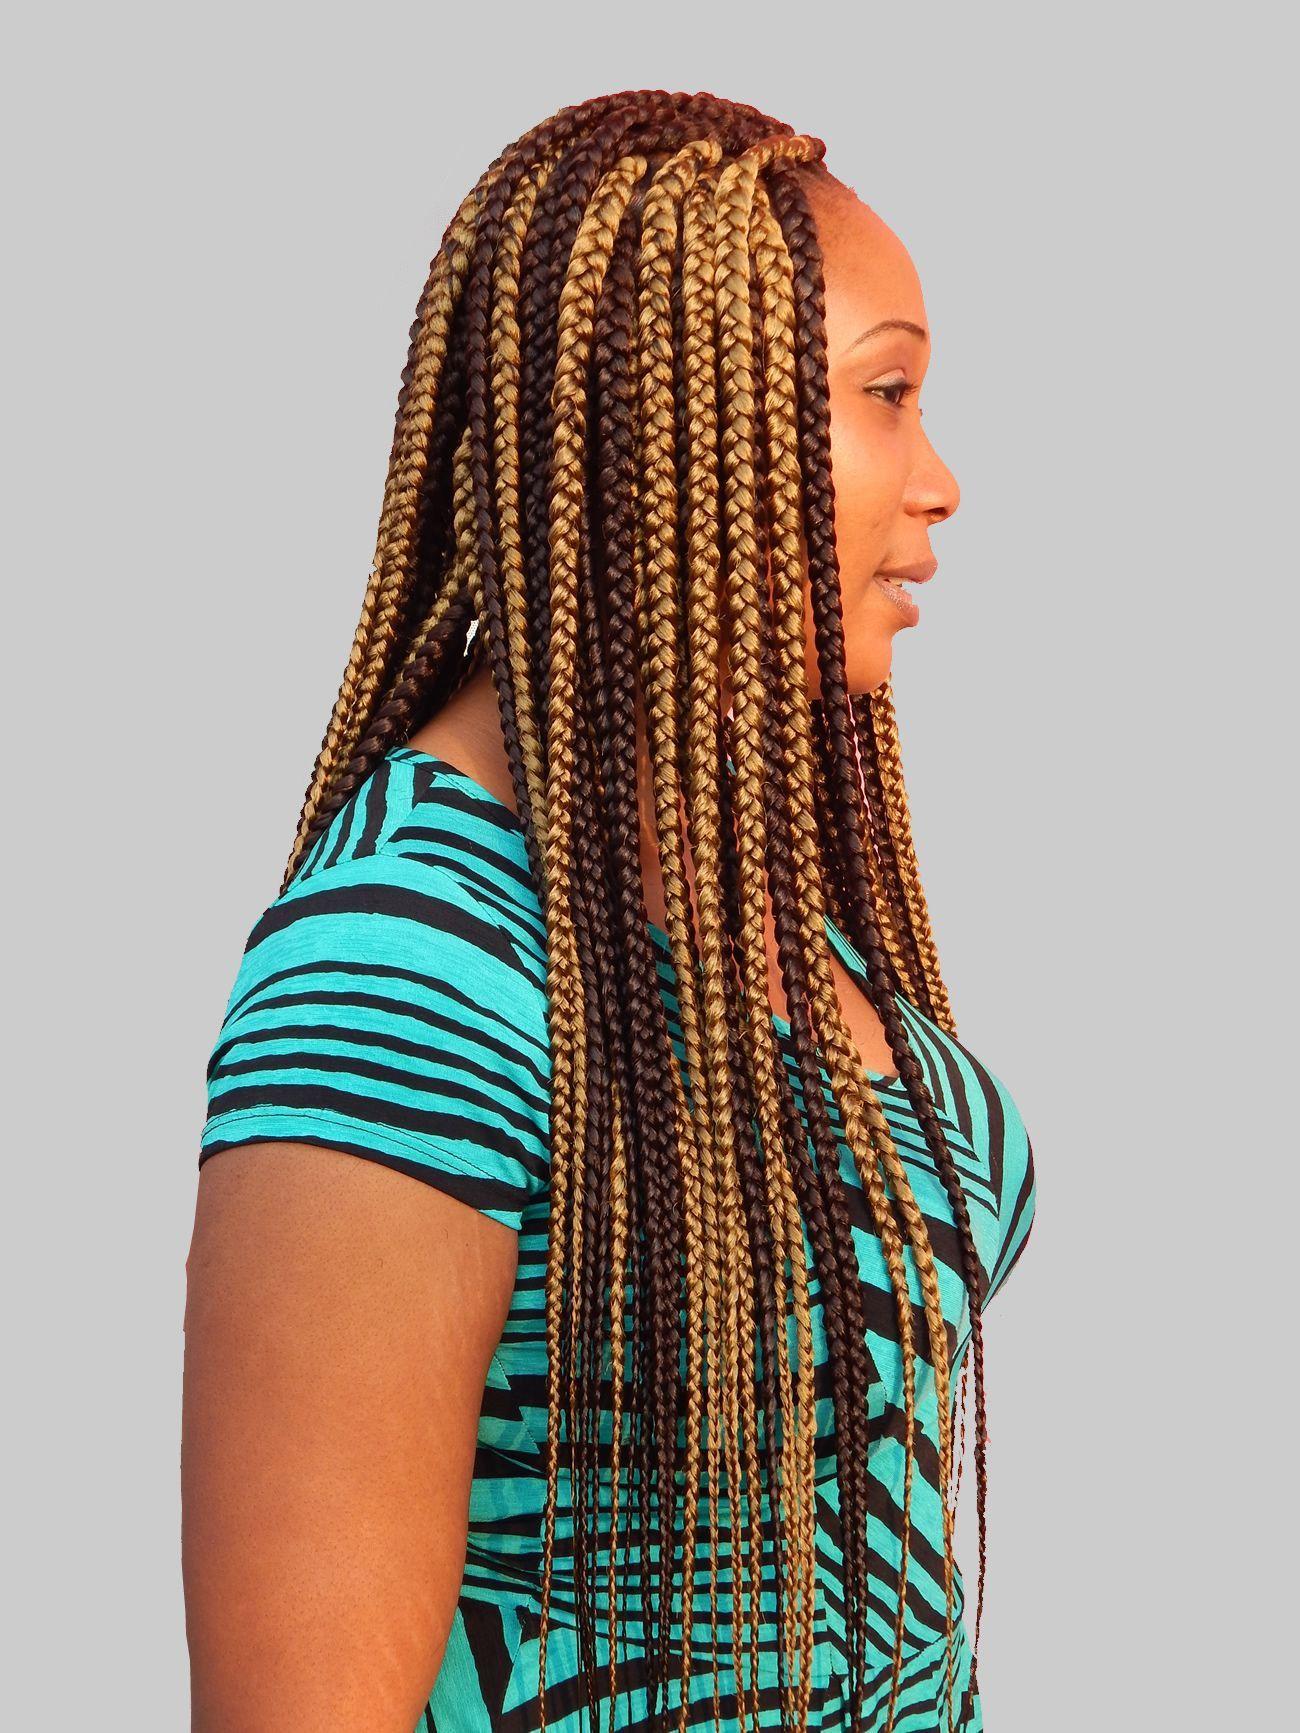 New Nigeria Bob Marley Hairstyle 2020 Marley Hair Hair Styles Marley Braids